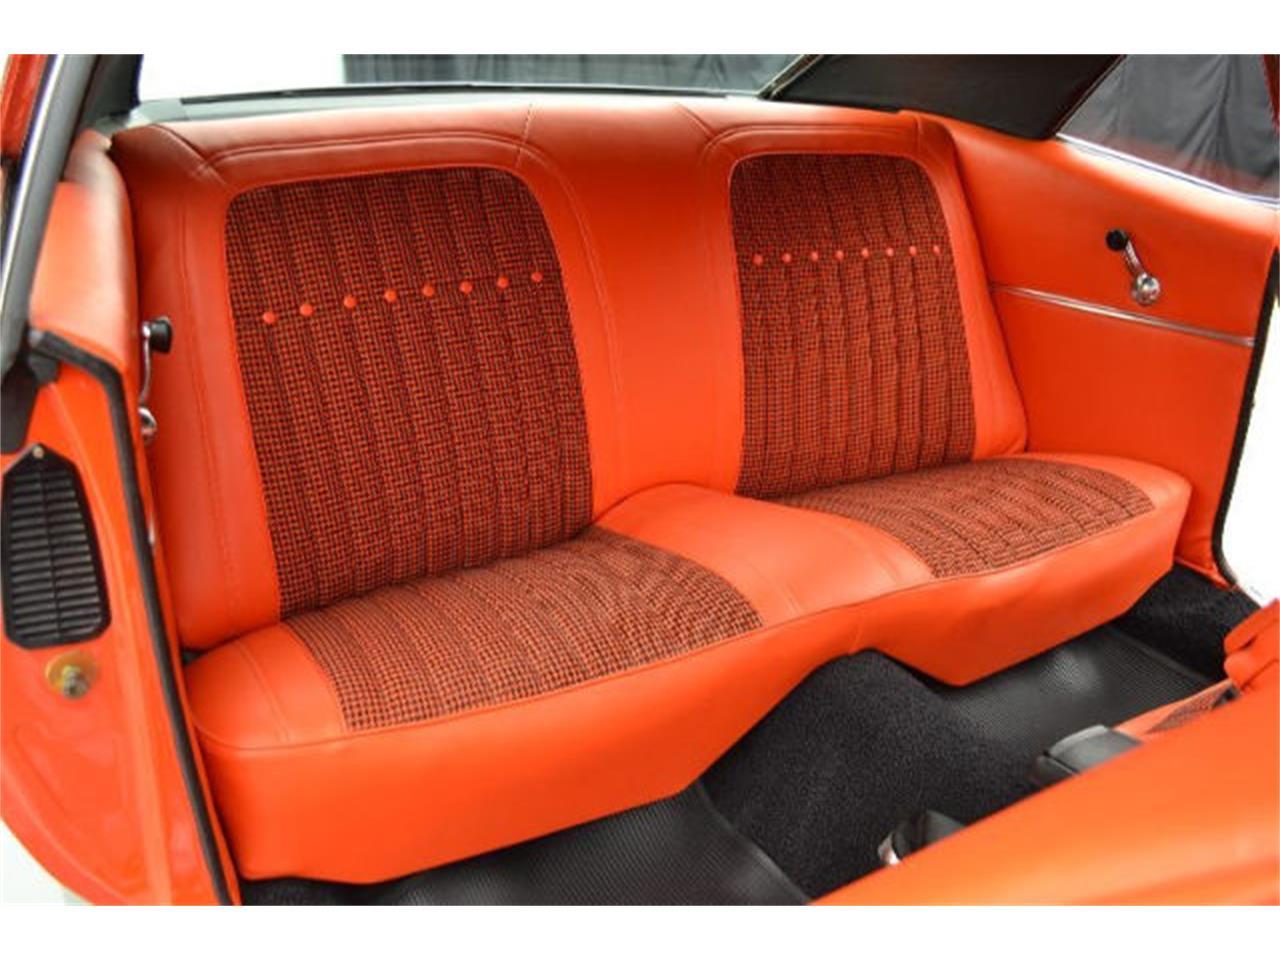 Large Picture of '69 Camaro located in North Carolina - $58,900.00 - 92DQ